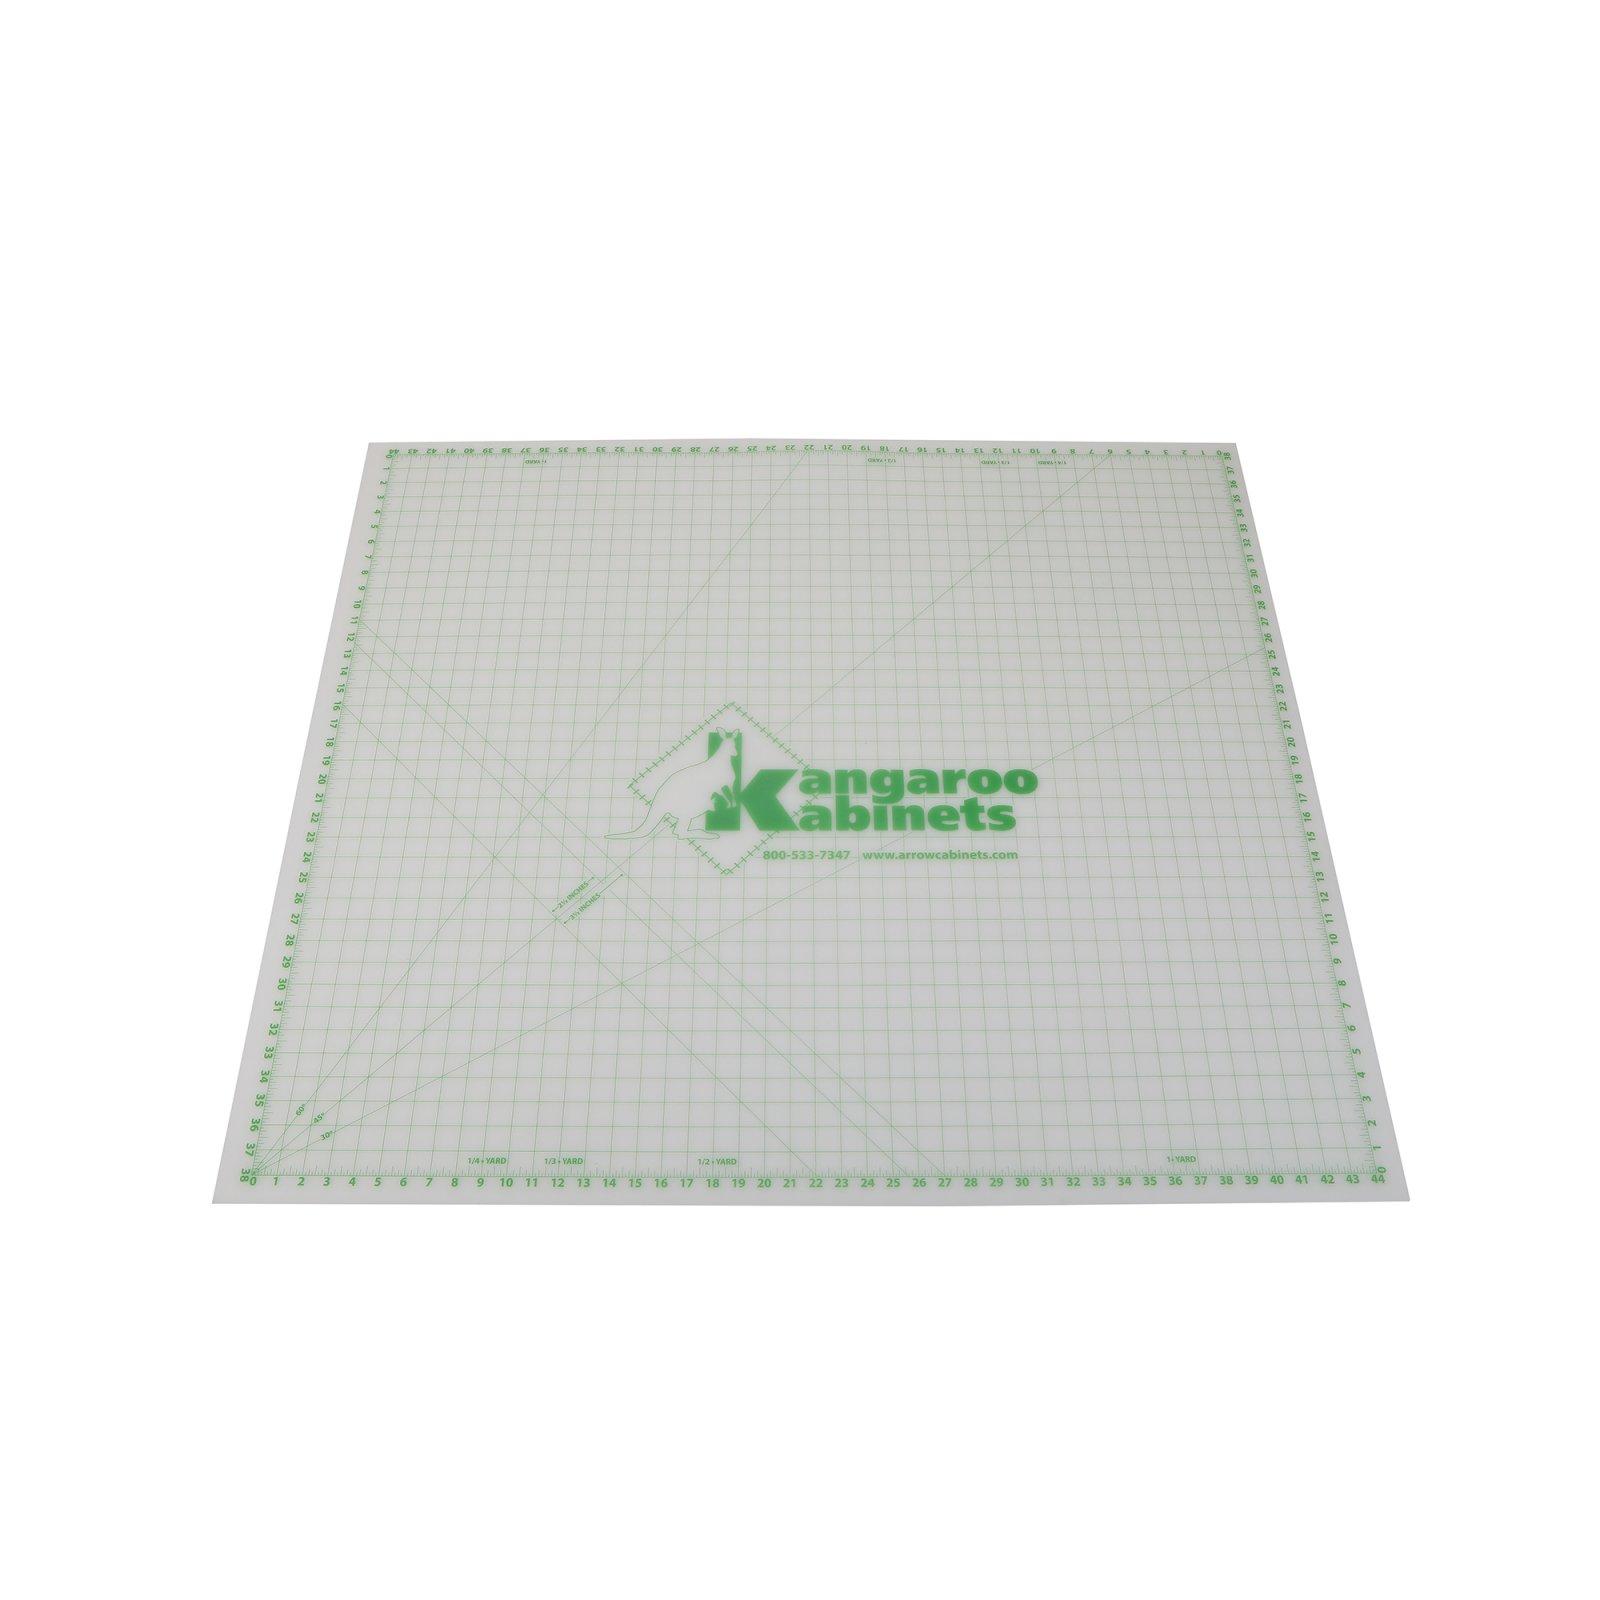 Arrow Cutting Mat (36 x48) for Dixie Cutting Table